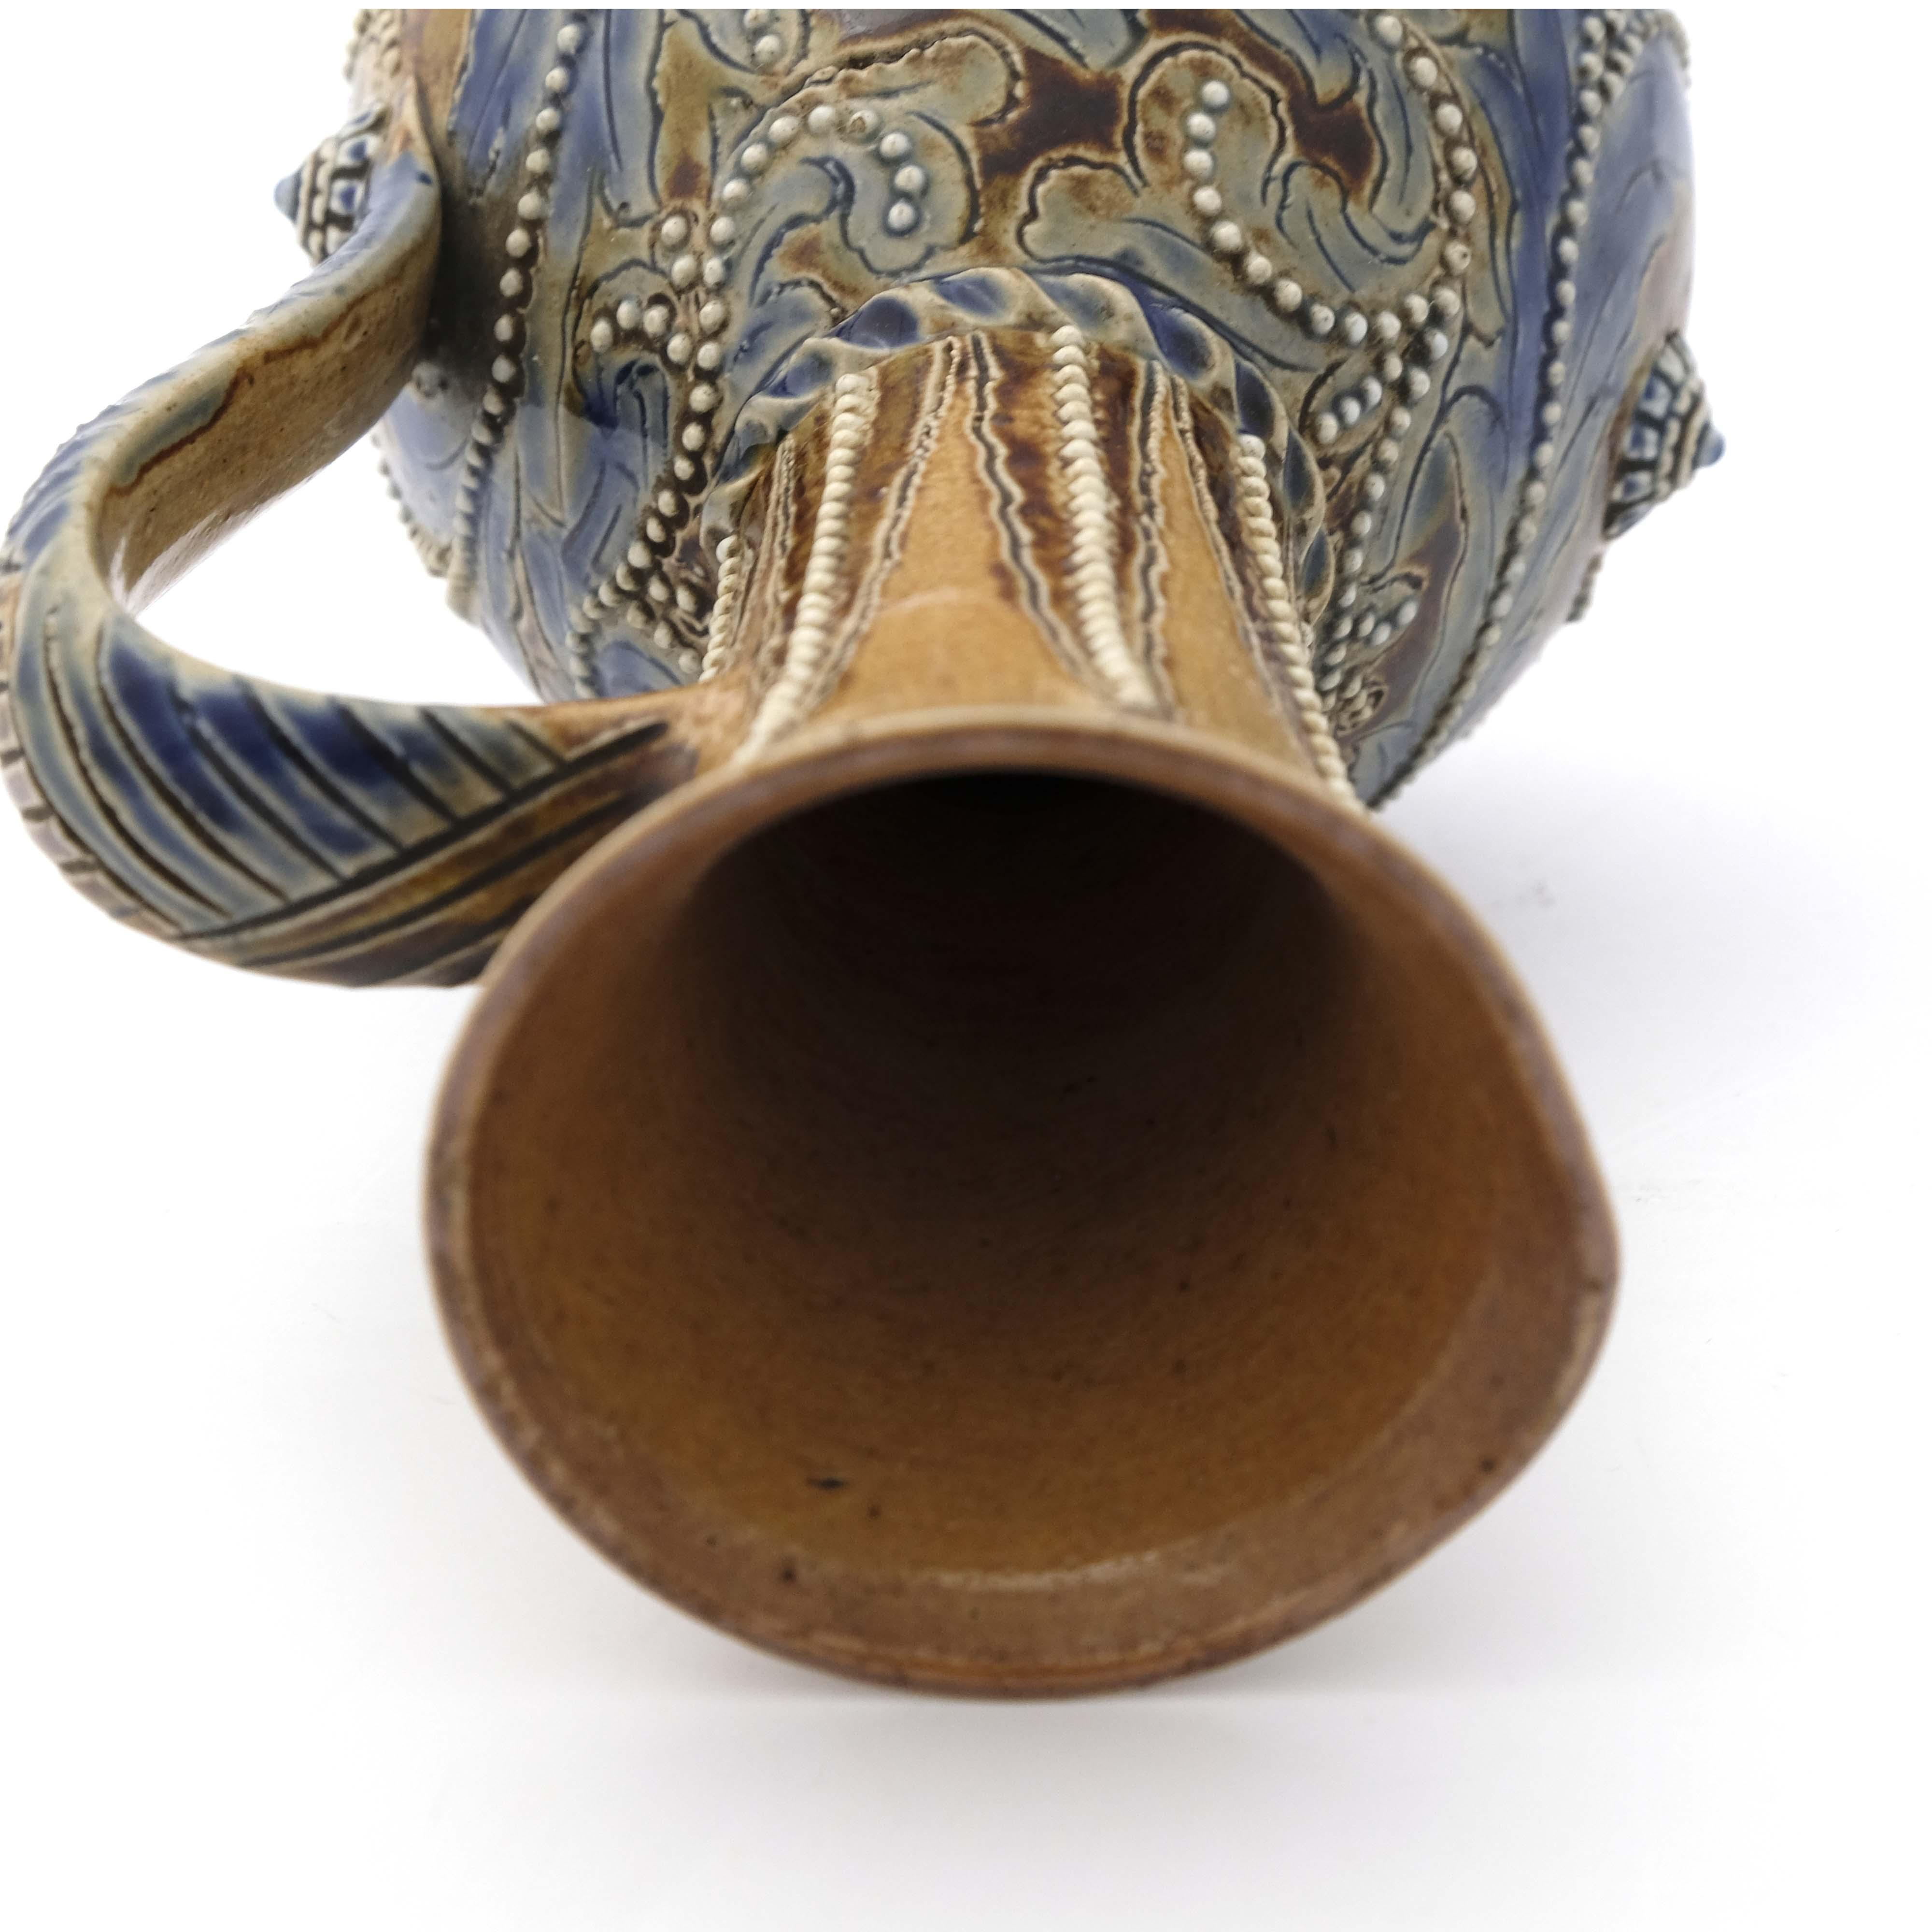 Frank Butler for Doulton Lambeth, a stoneware jug - Image 5 of 6